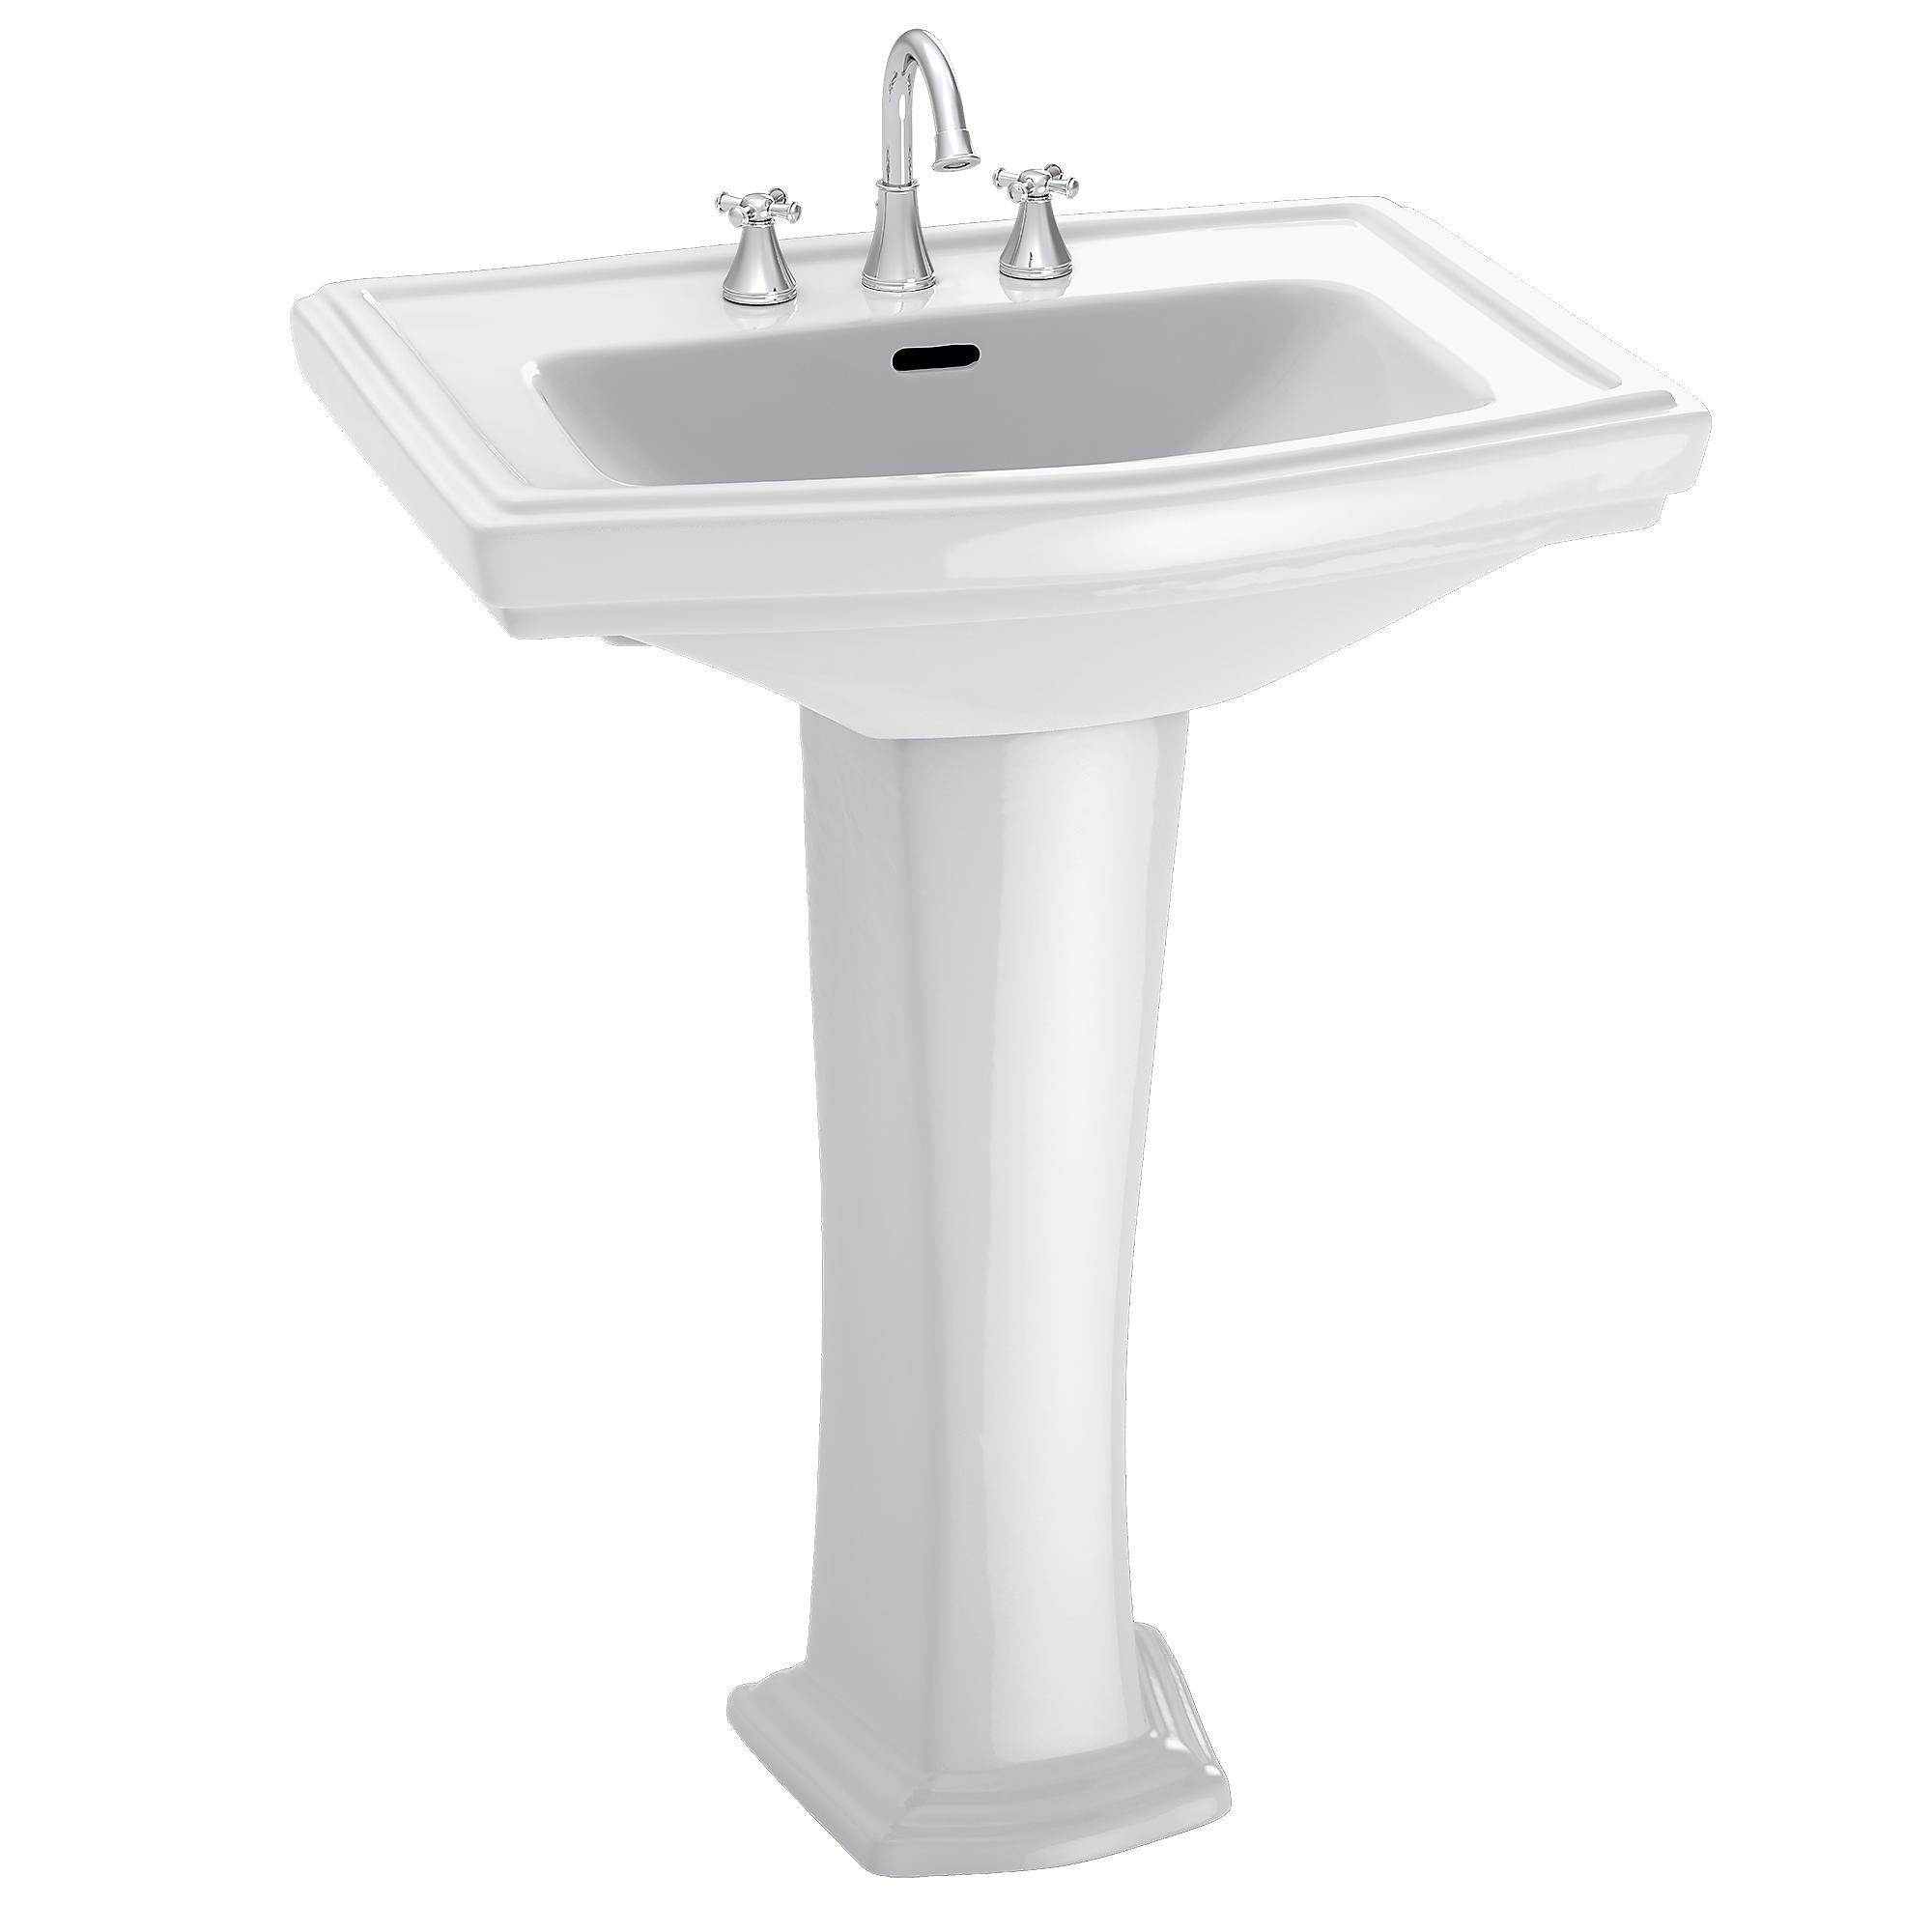 Lpt780 11 clayton  pedestal lavatory 0